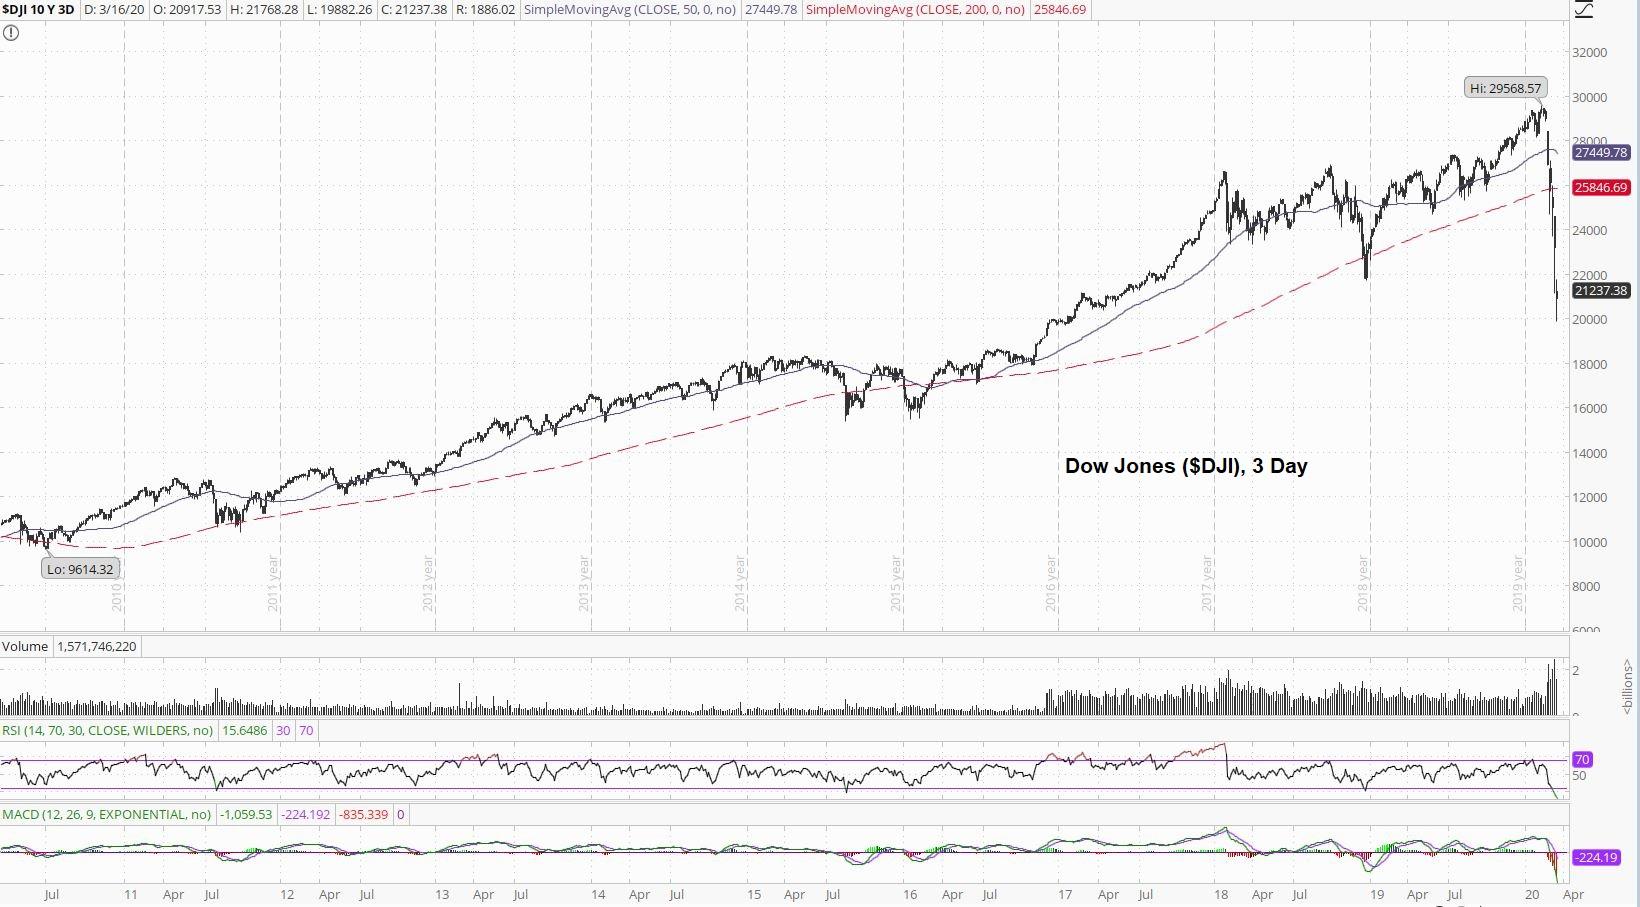 Dow Jones 3 Day Chart